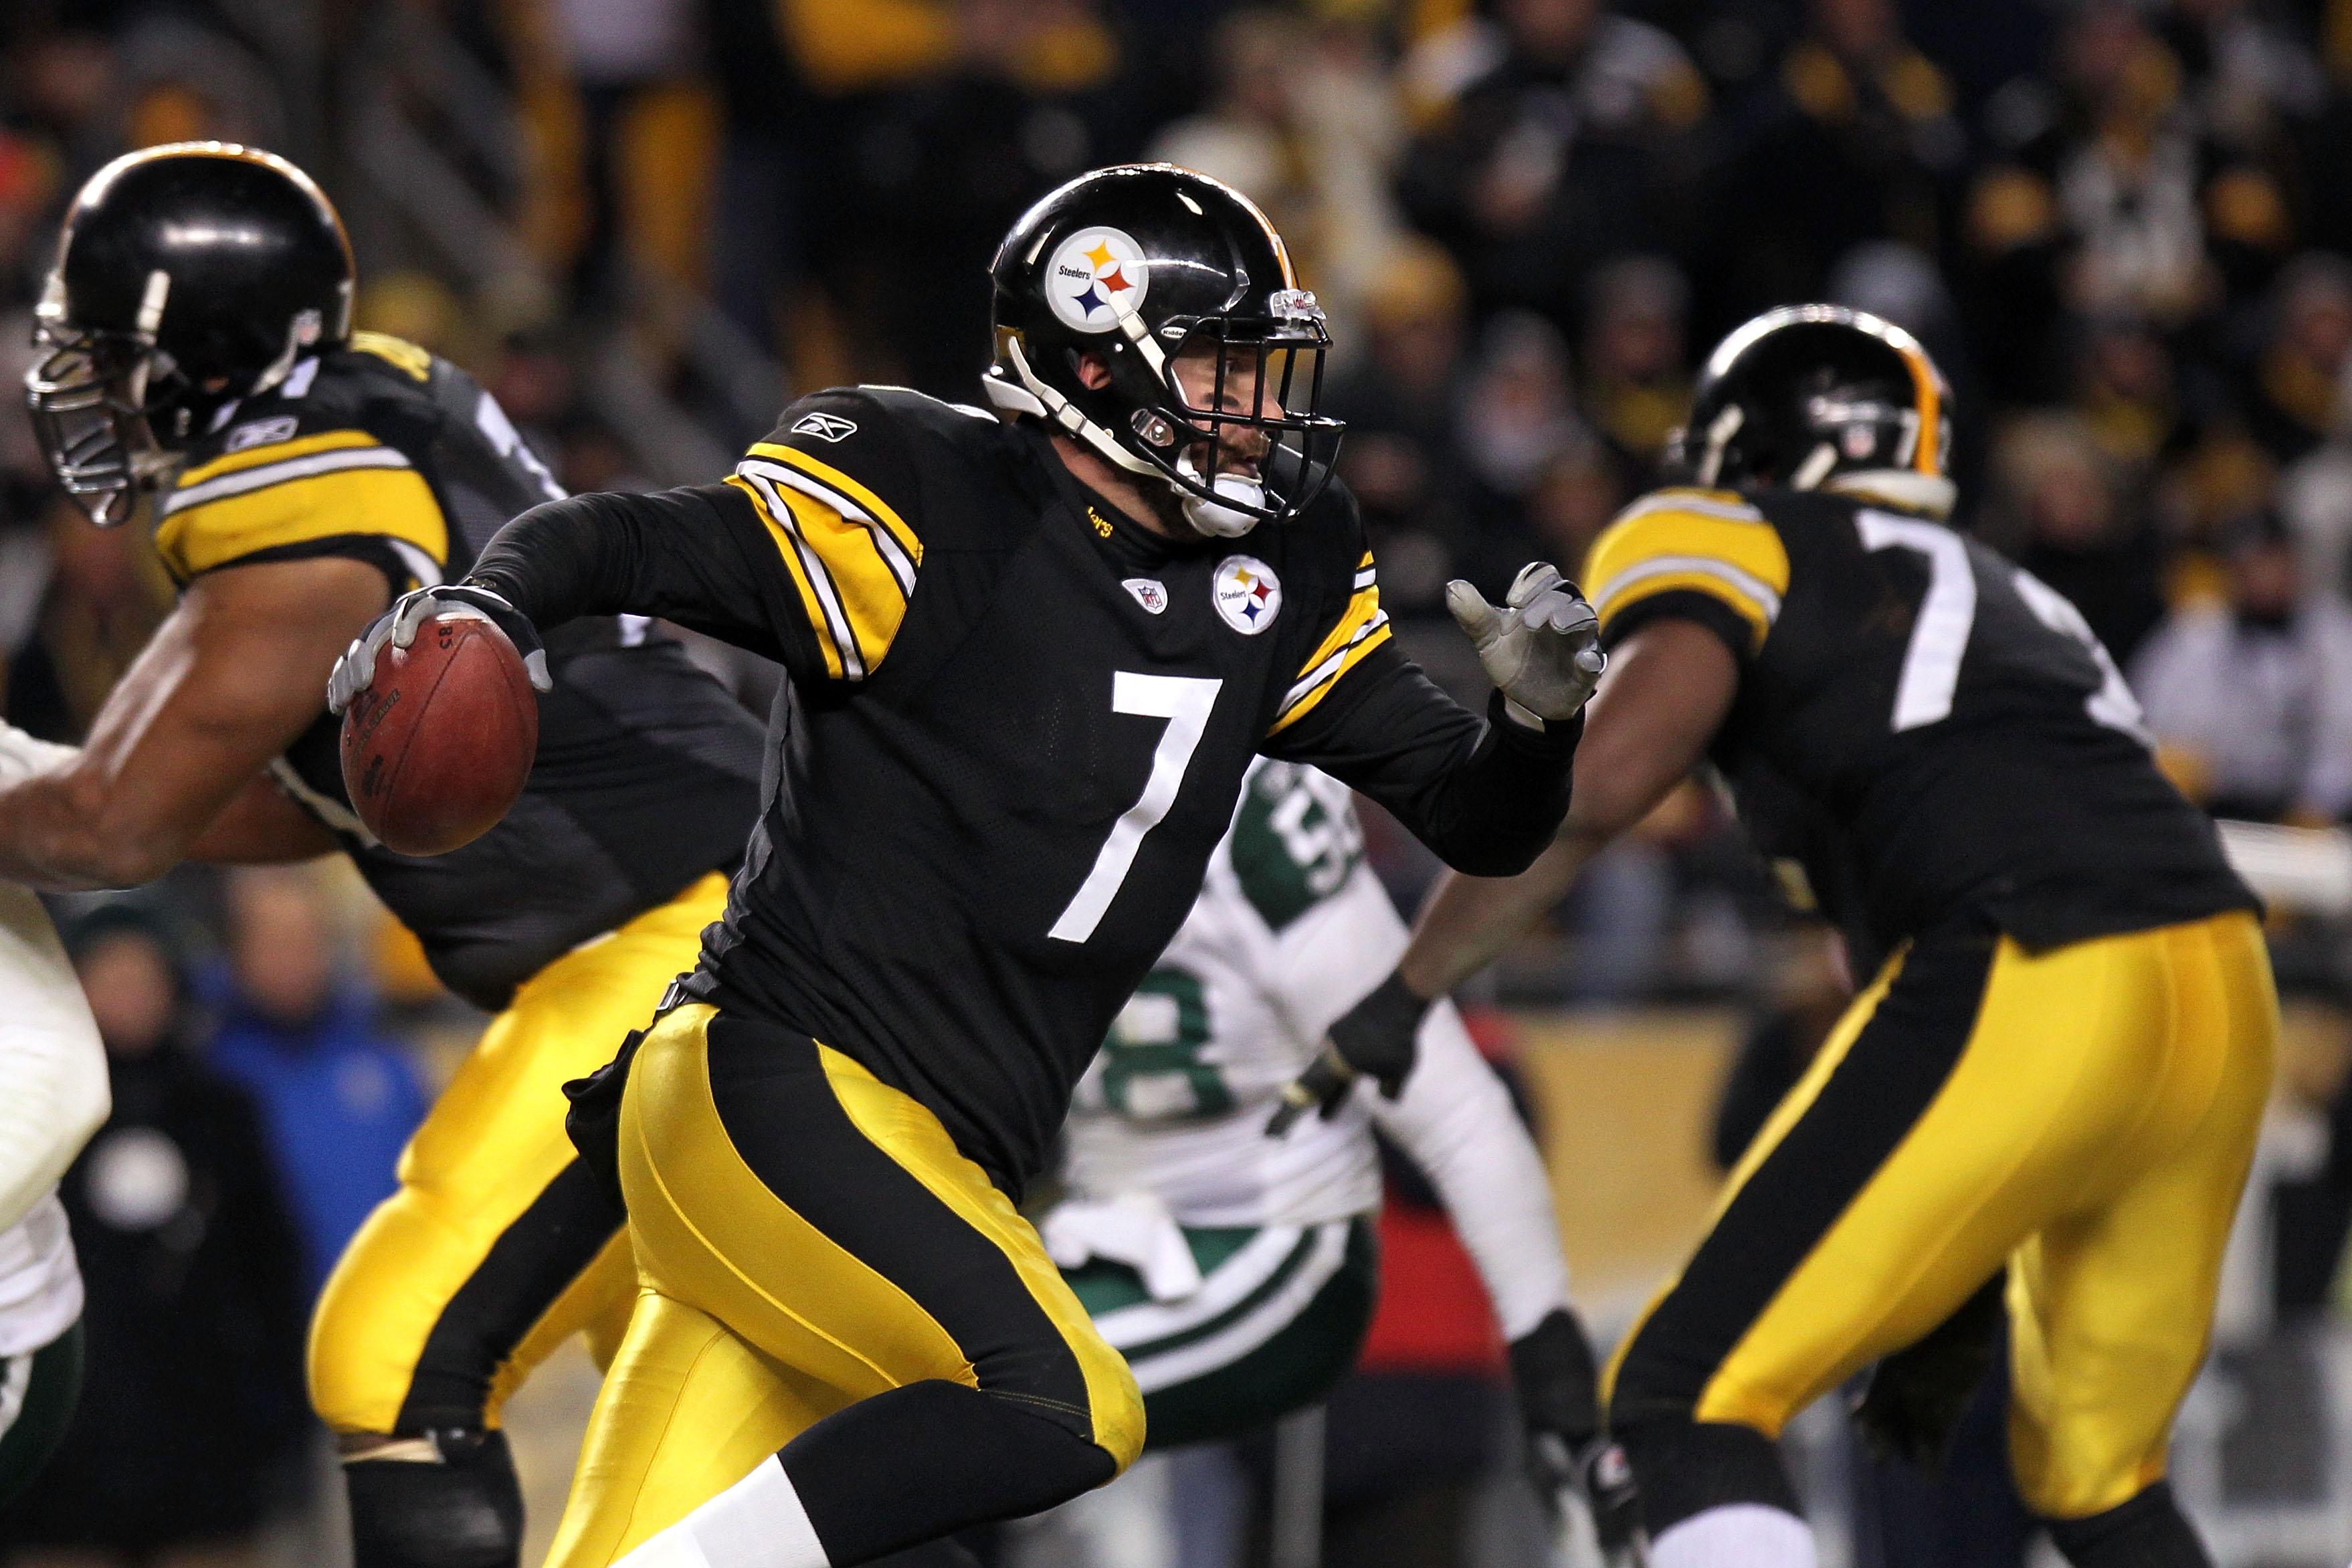 Ben Roethlisberger, quarterback degli Steelers